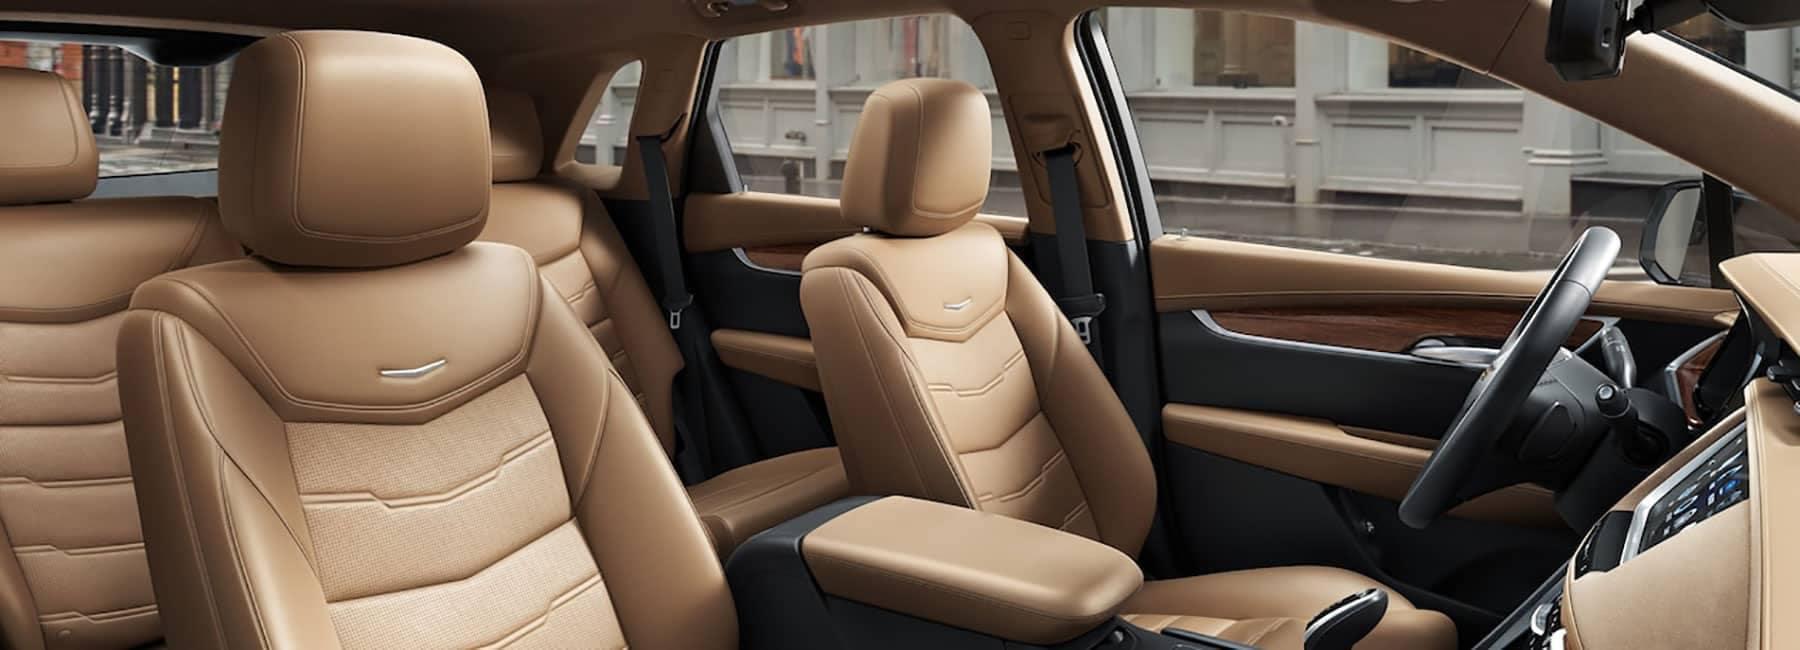 Cadillac-XT5-Interior-Front